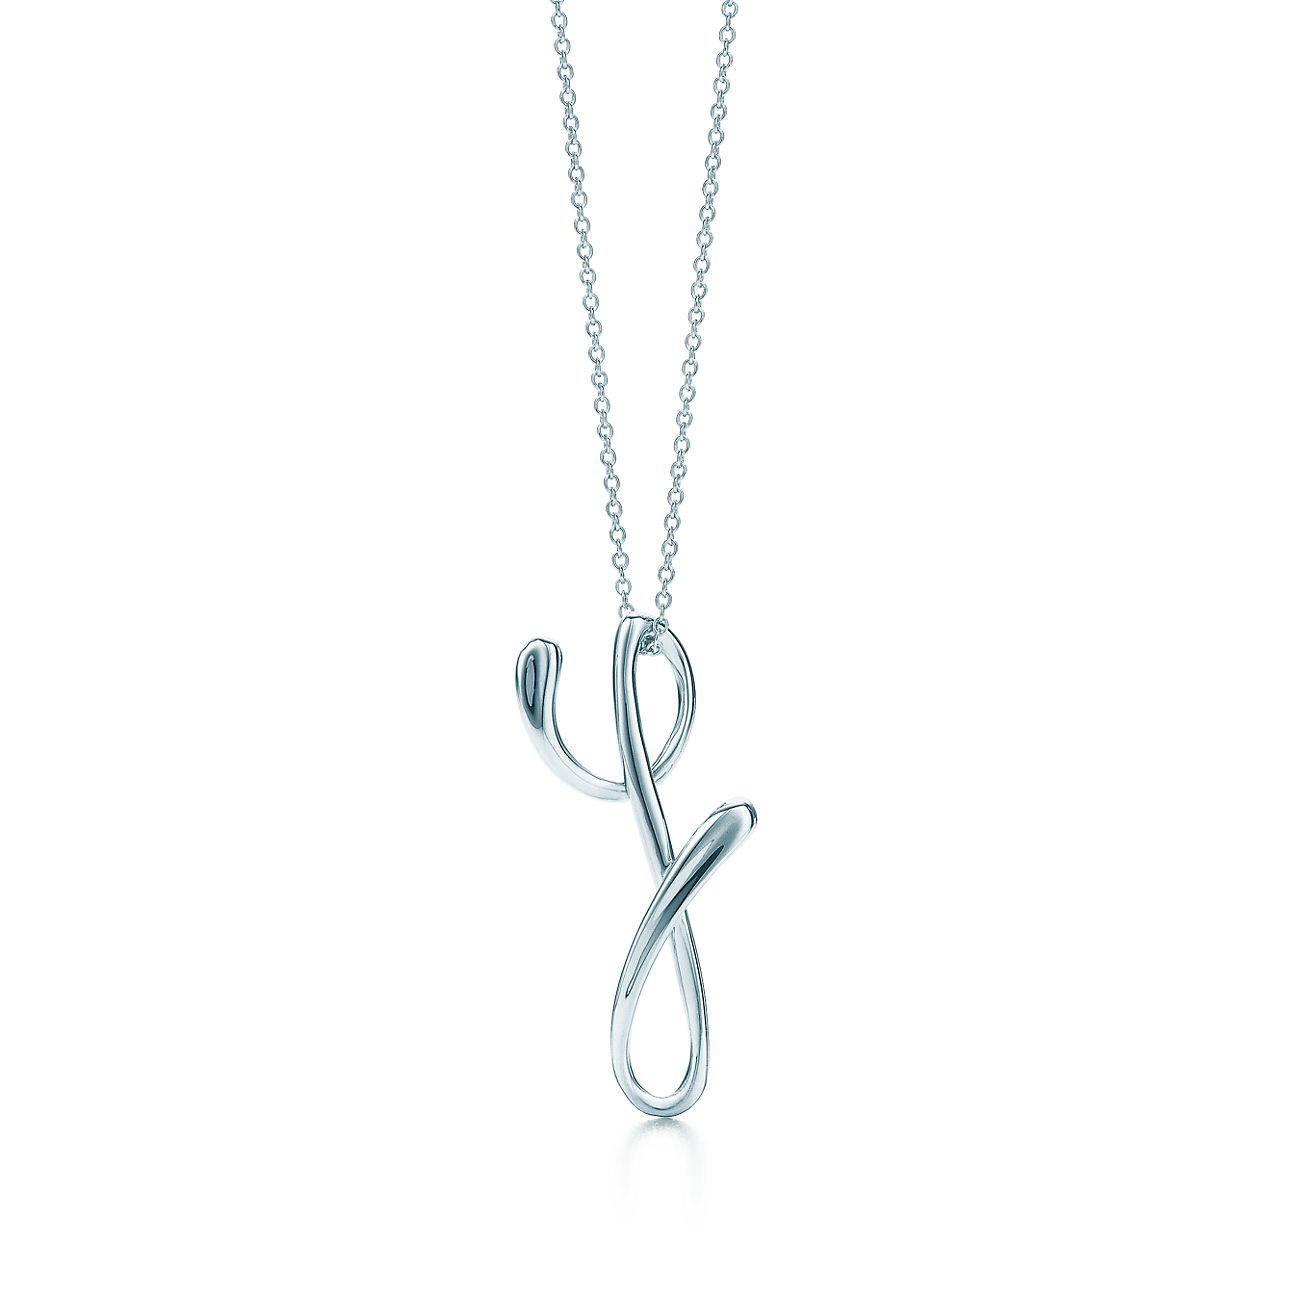 Elsa Peretti Lettre Pendentif Y En Argent Sterling, Petite - Taille Y Tiffany & Co.